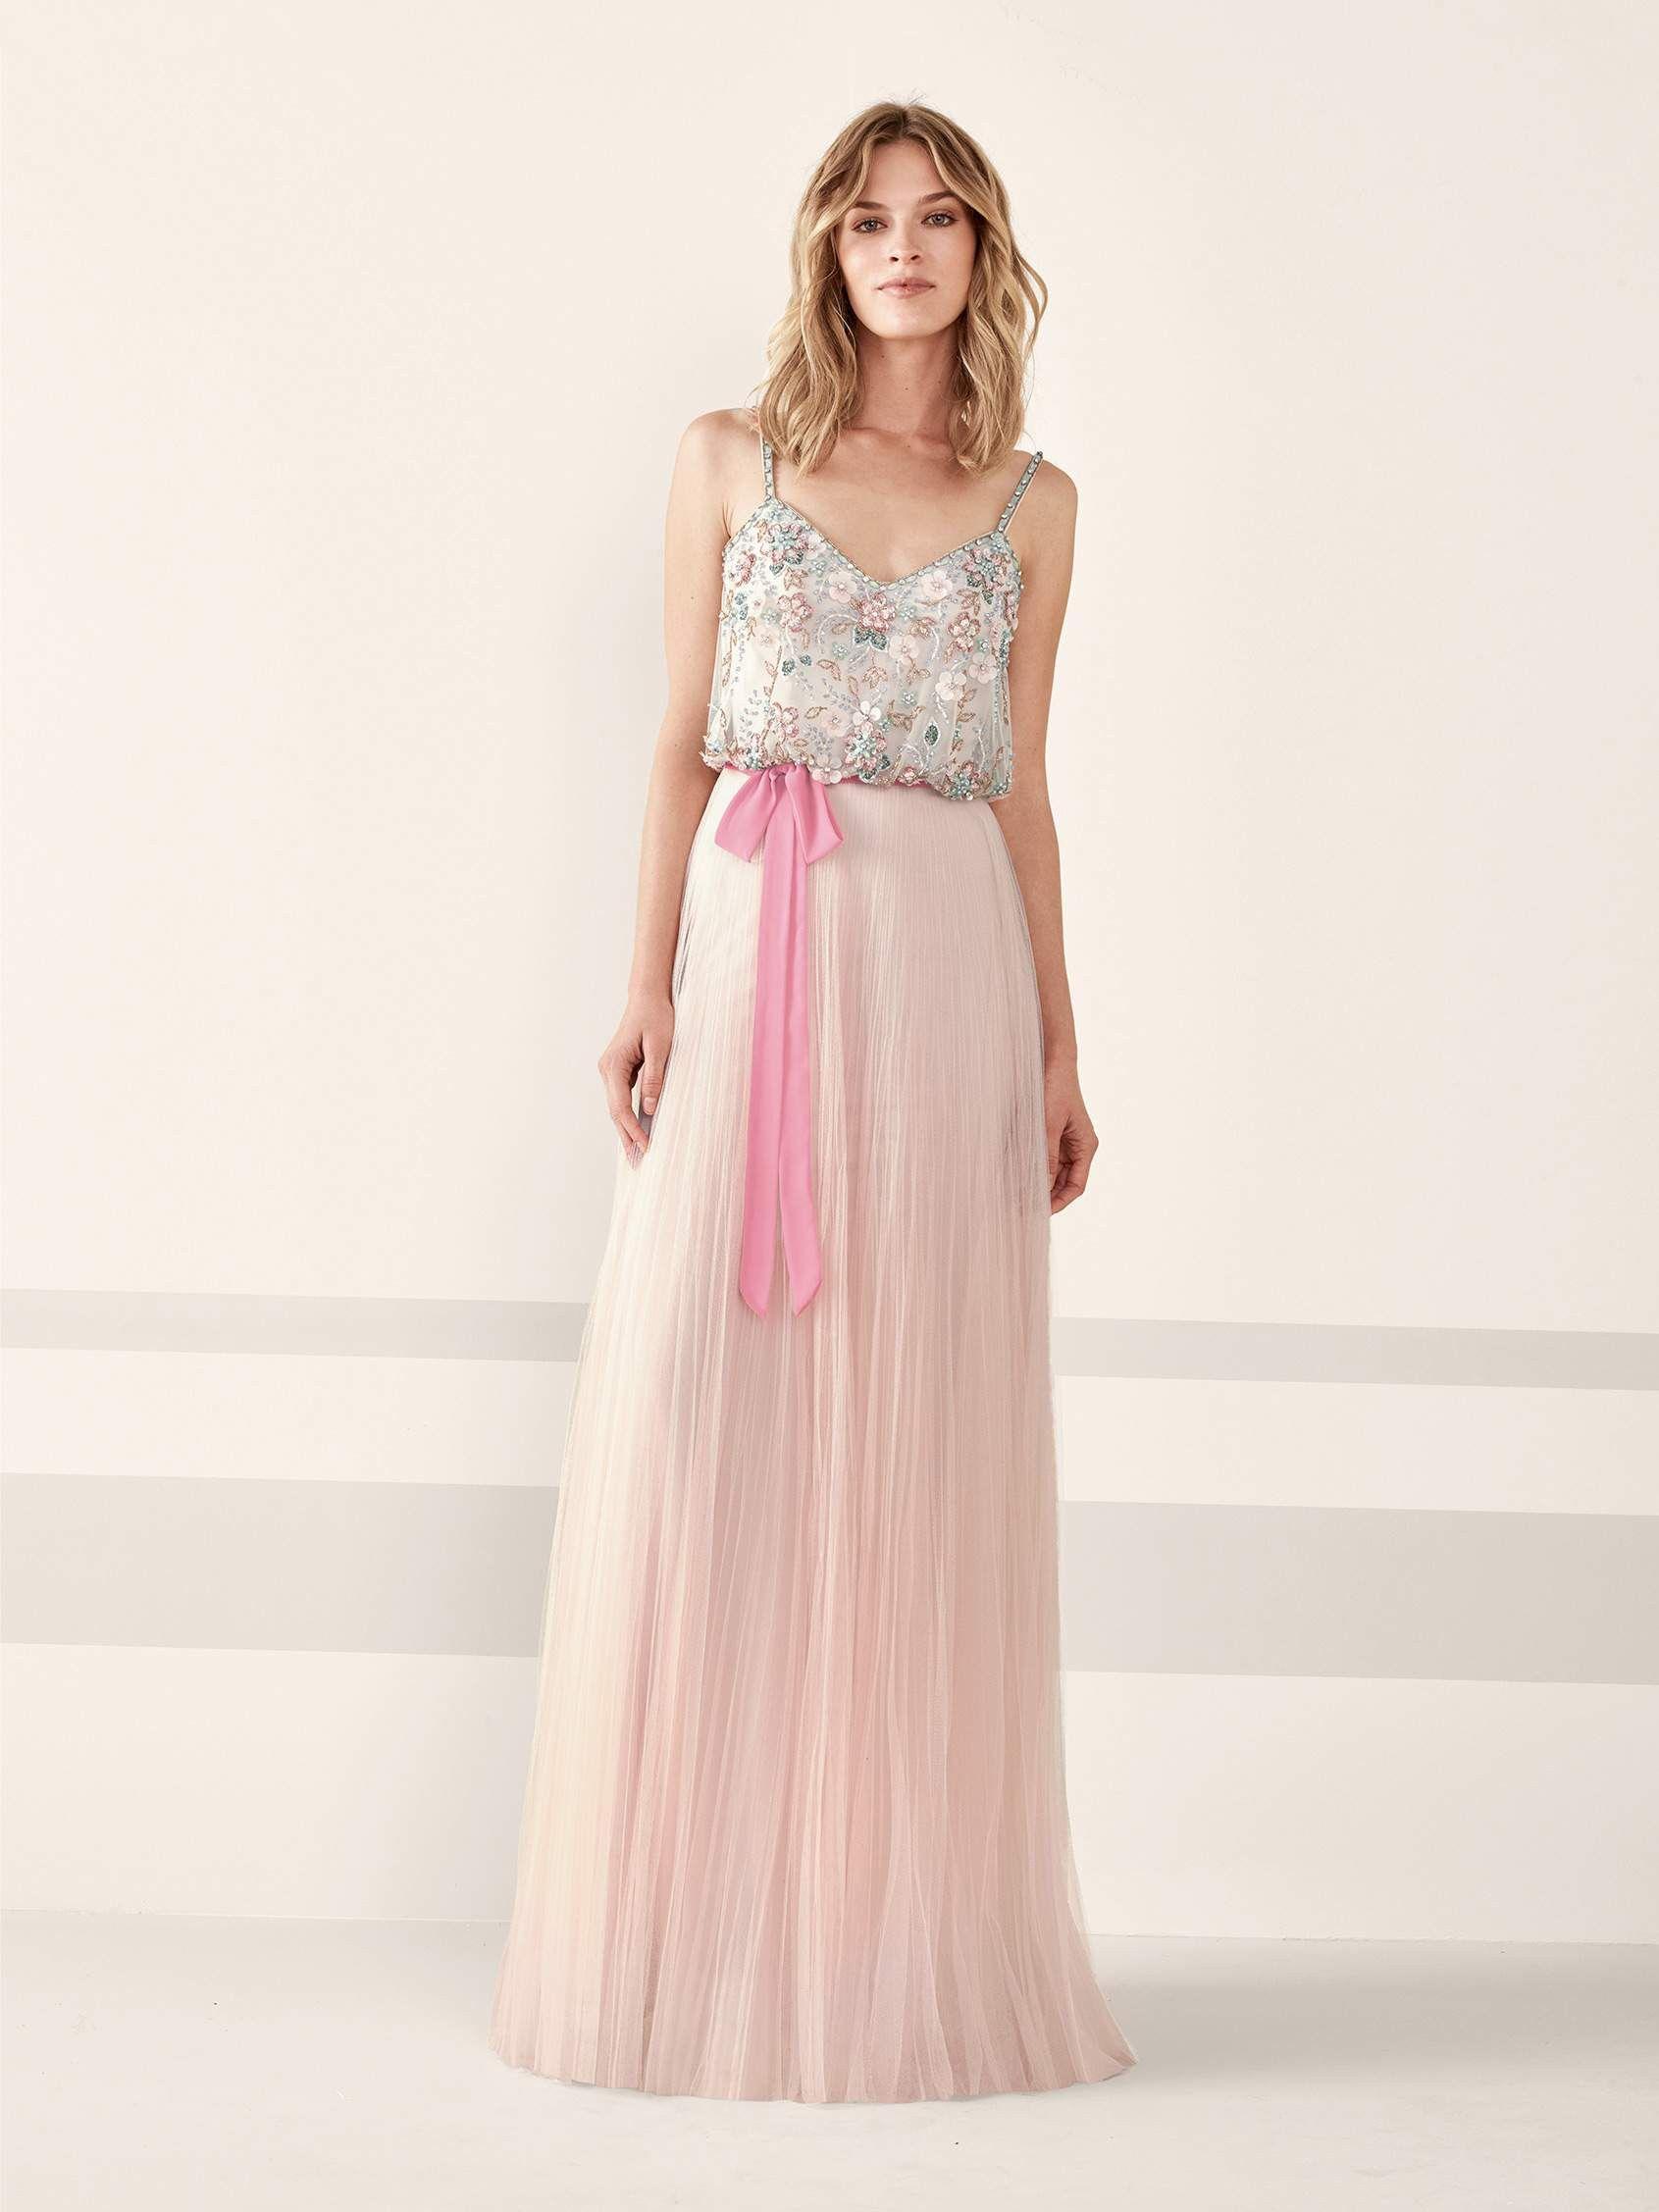 vestido-fluido-fiesta-sin-mangas | vestidos fiesta | Pinterest ...